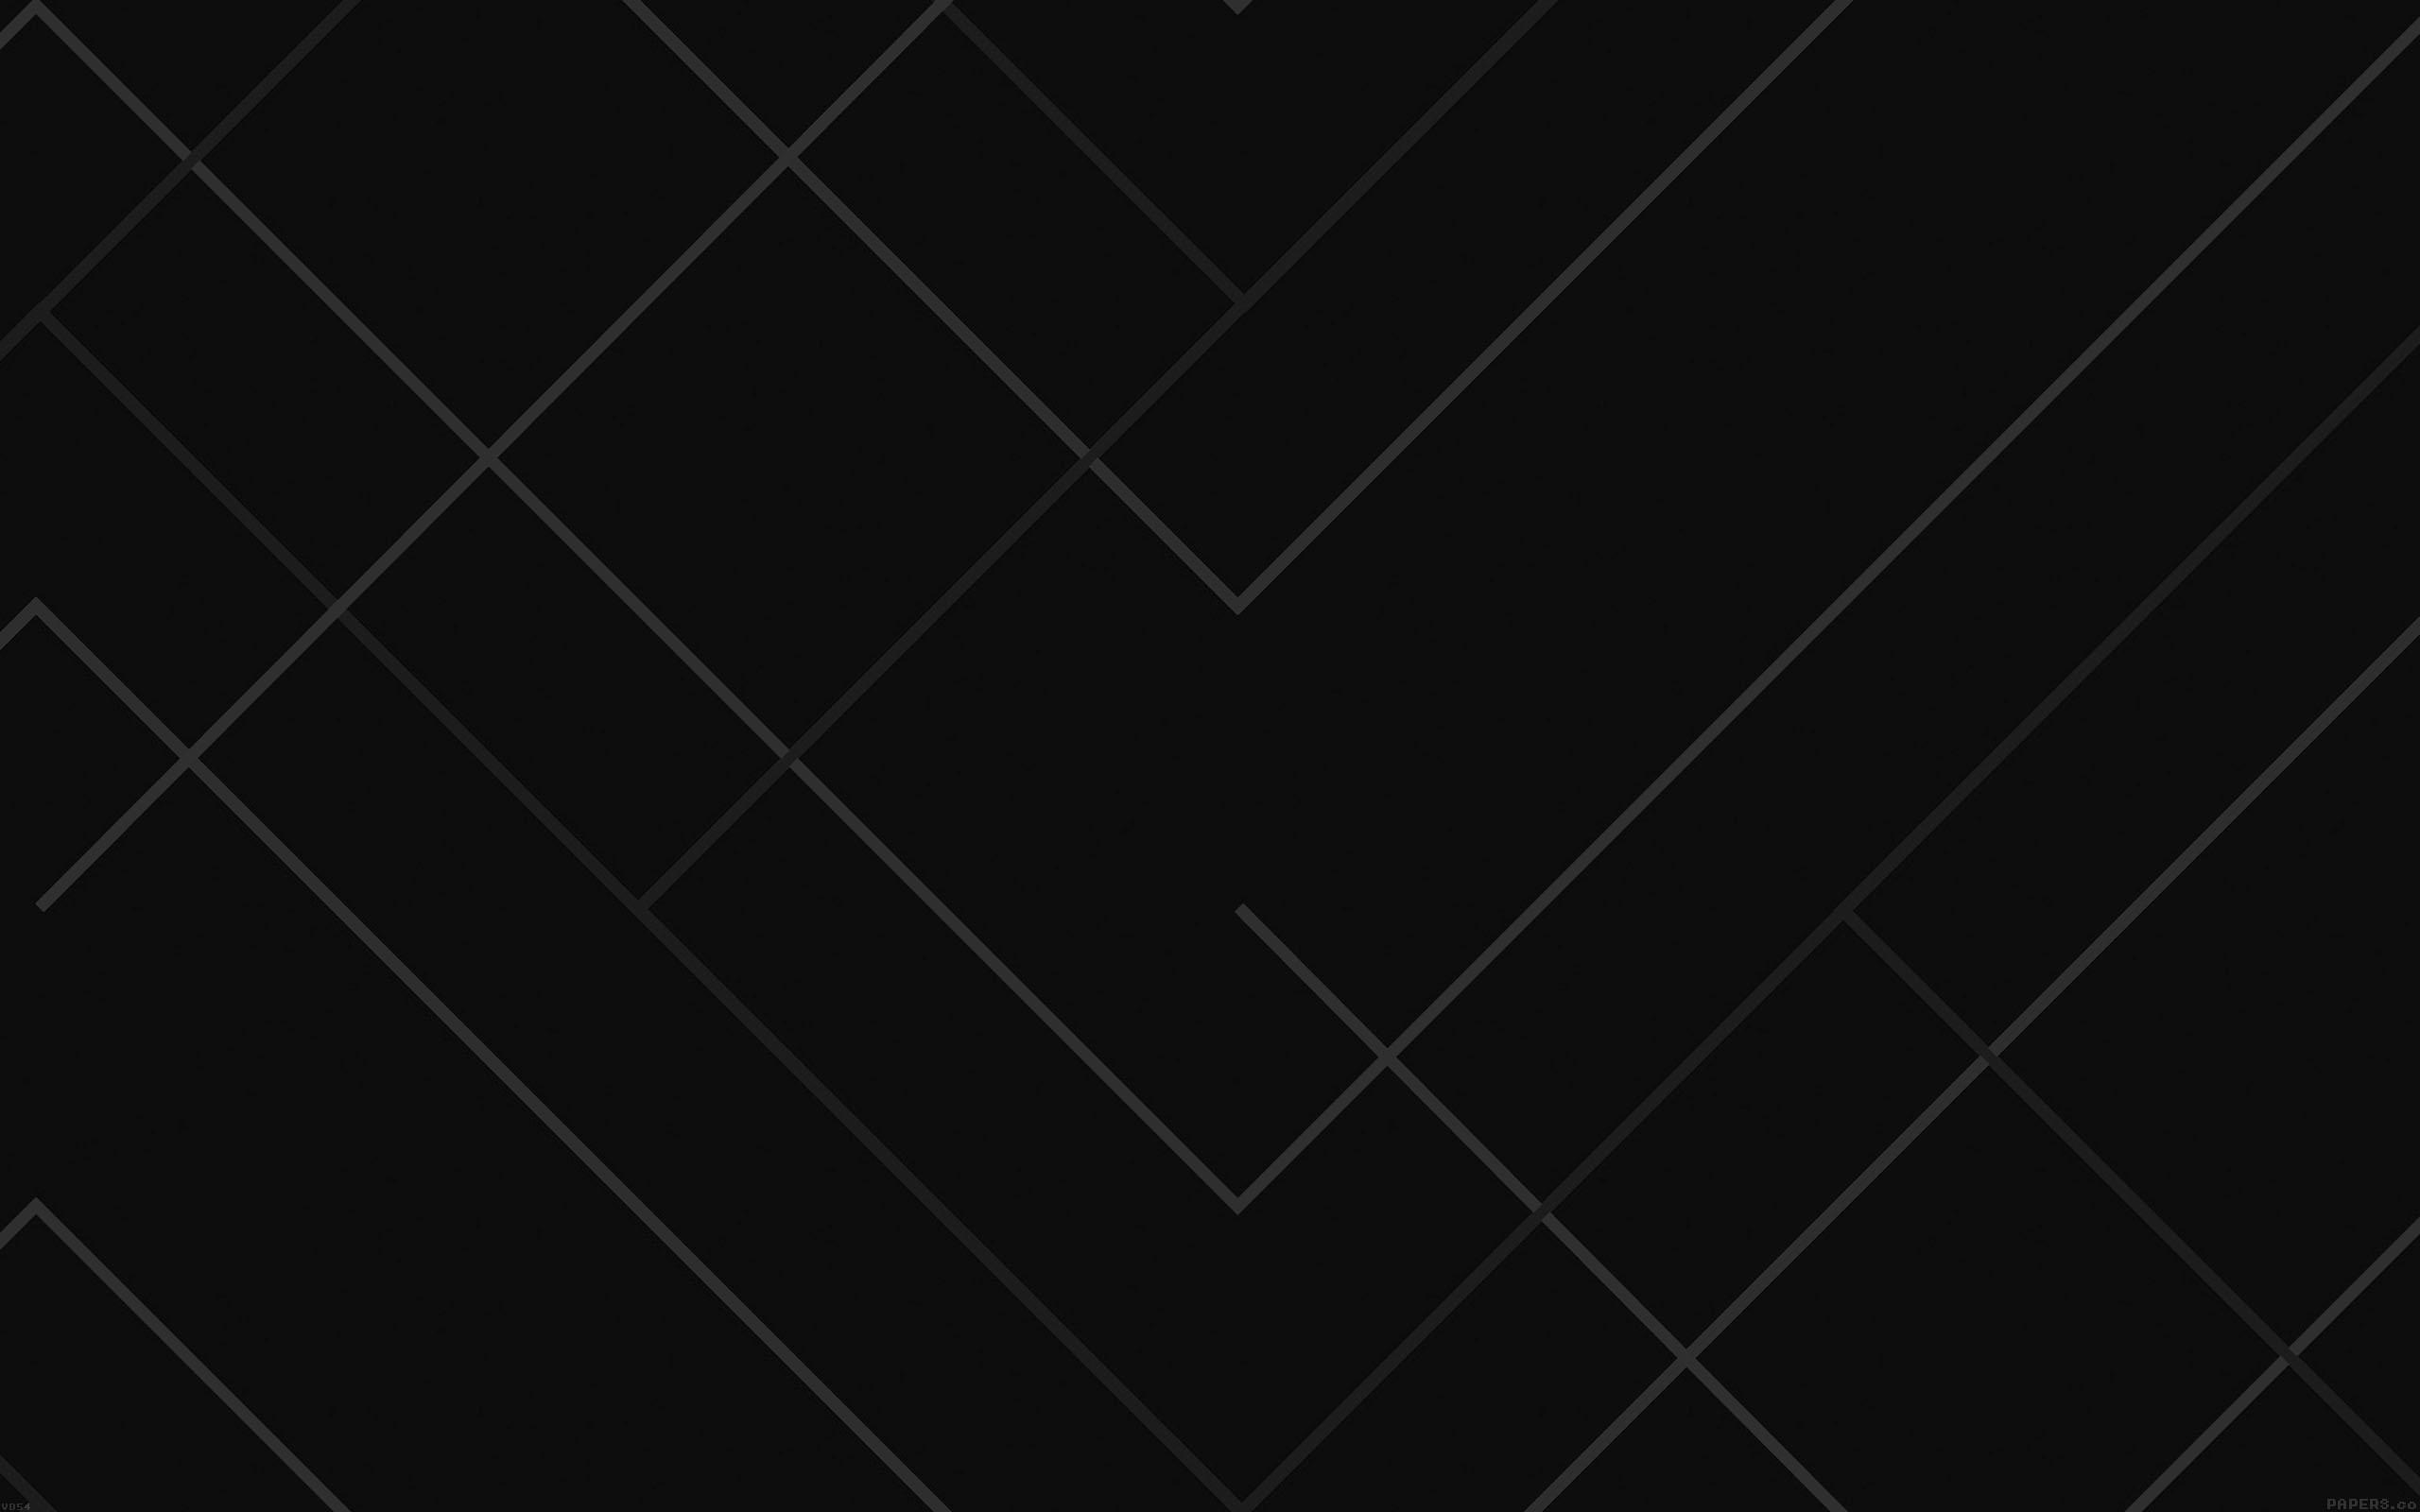 vd54abstractblackgeometriclinepattern